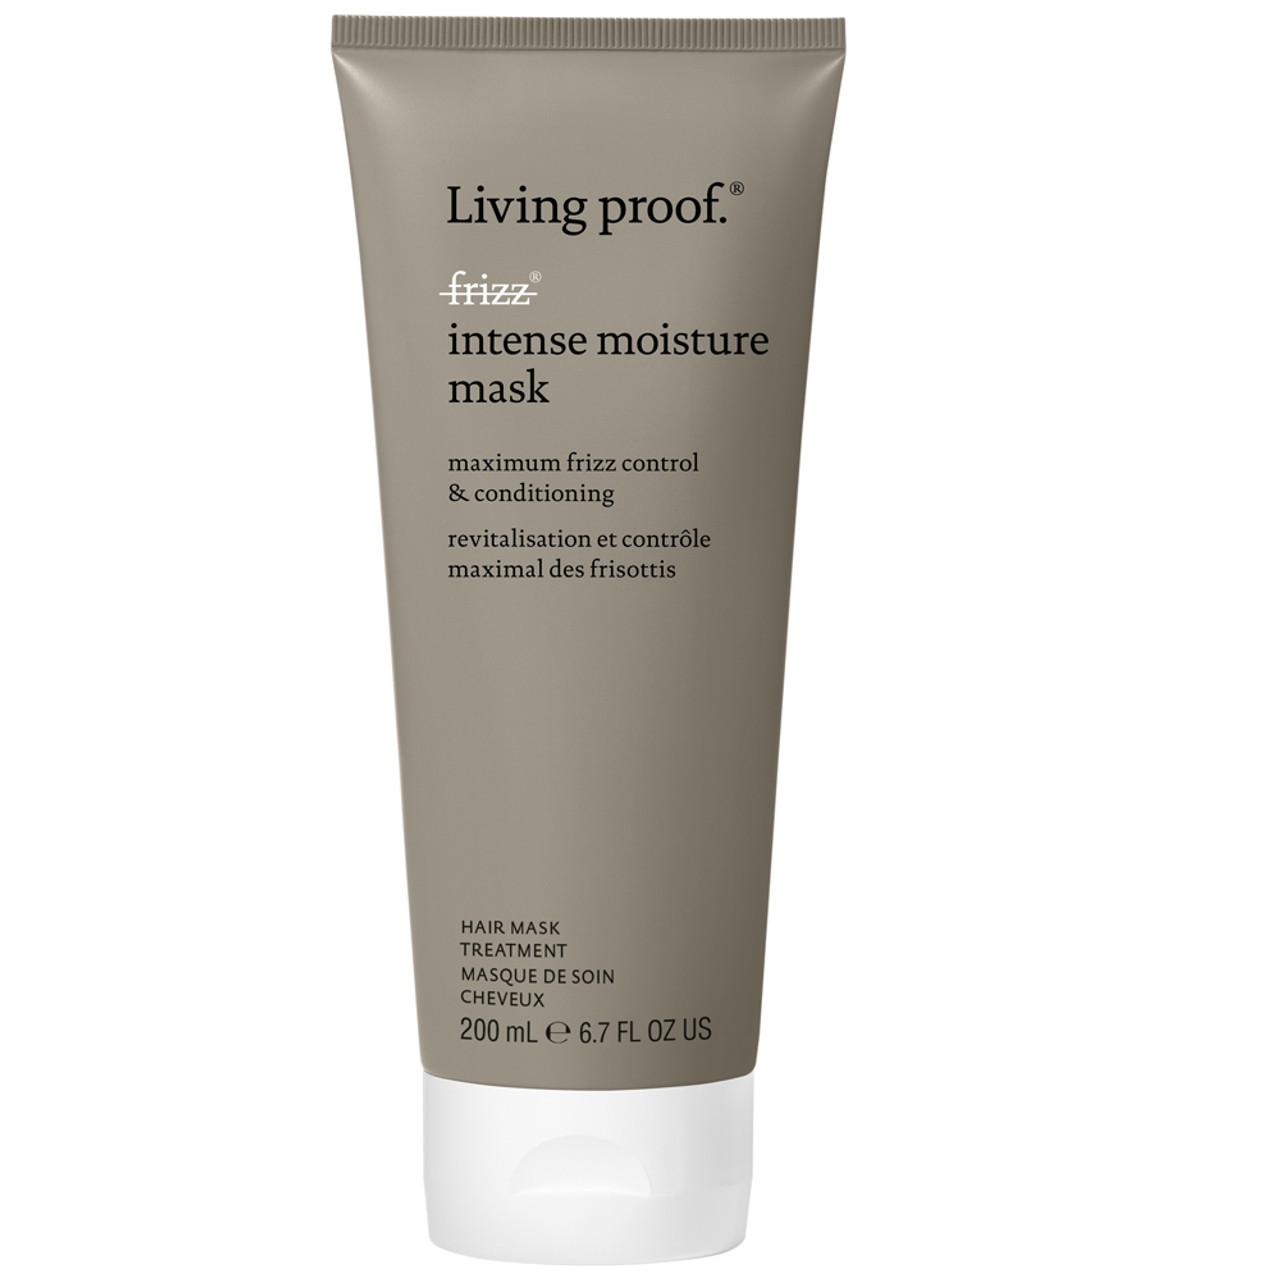 Living Proof No Frizz Intense Moisture Mask BeautifiedYou.com